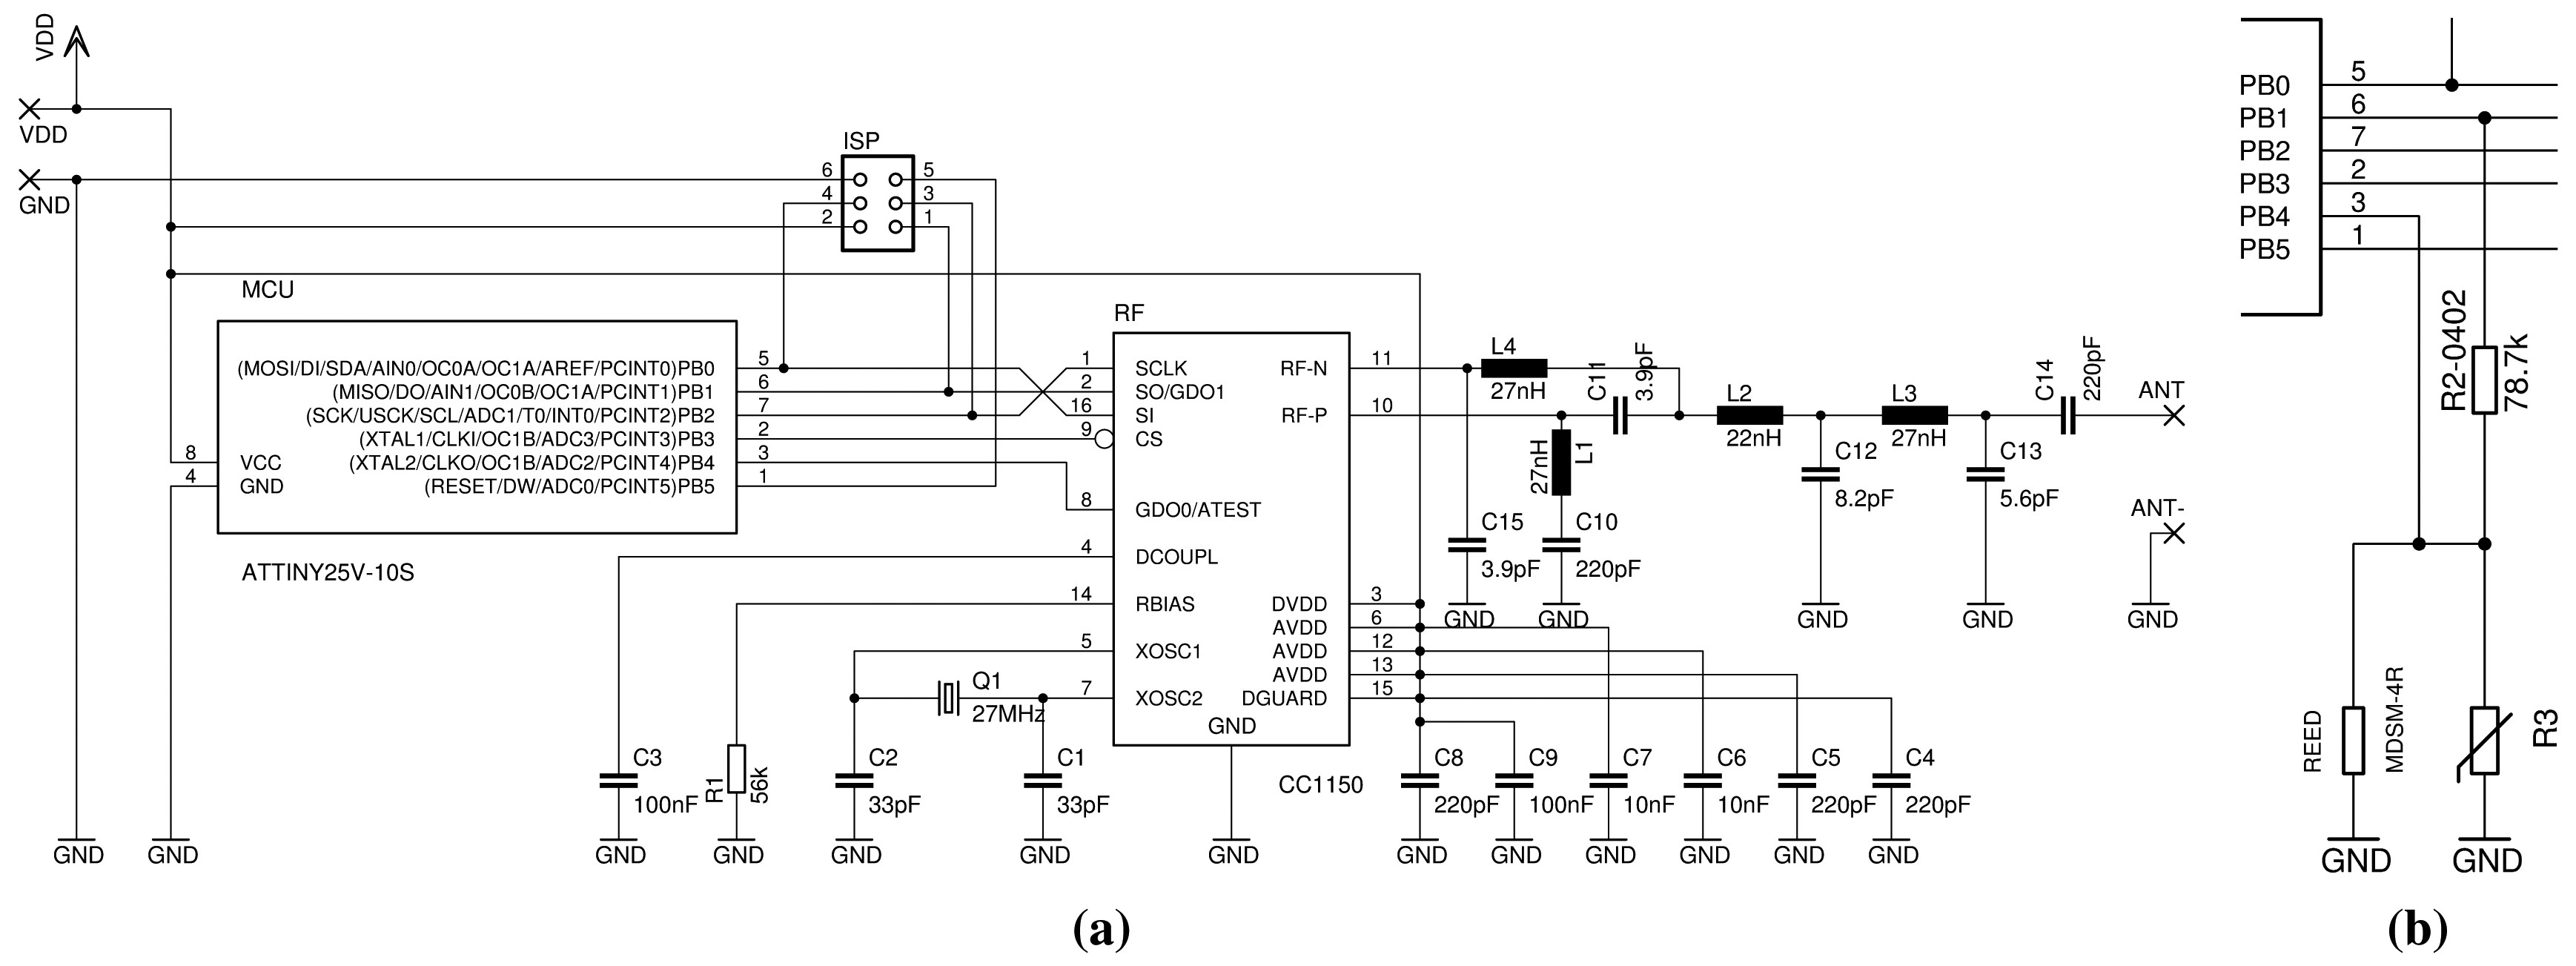 Kib Systems Monitor Panel Schematic Ks 3989] Kib Monitor Wiring Diagram Free Diagram Of Kib Systems Monitor Panel Schematic